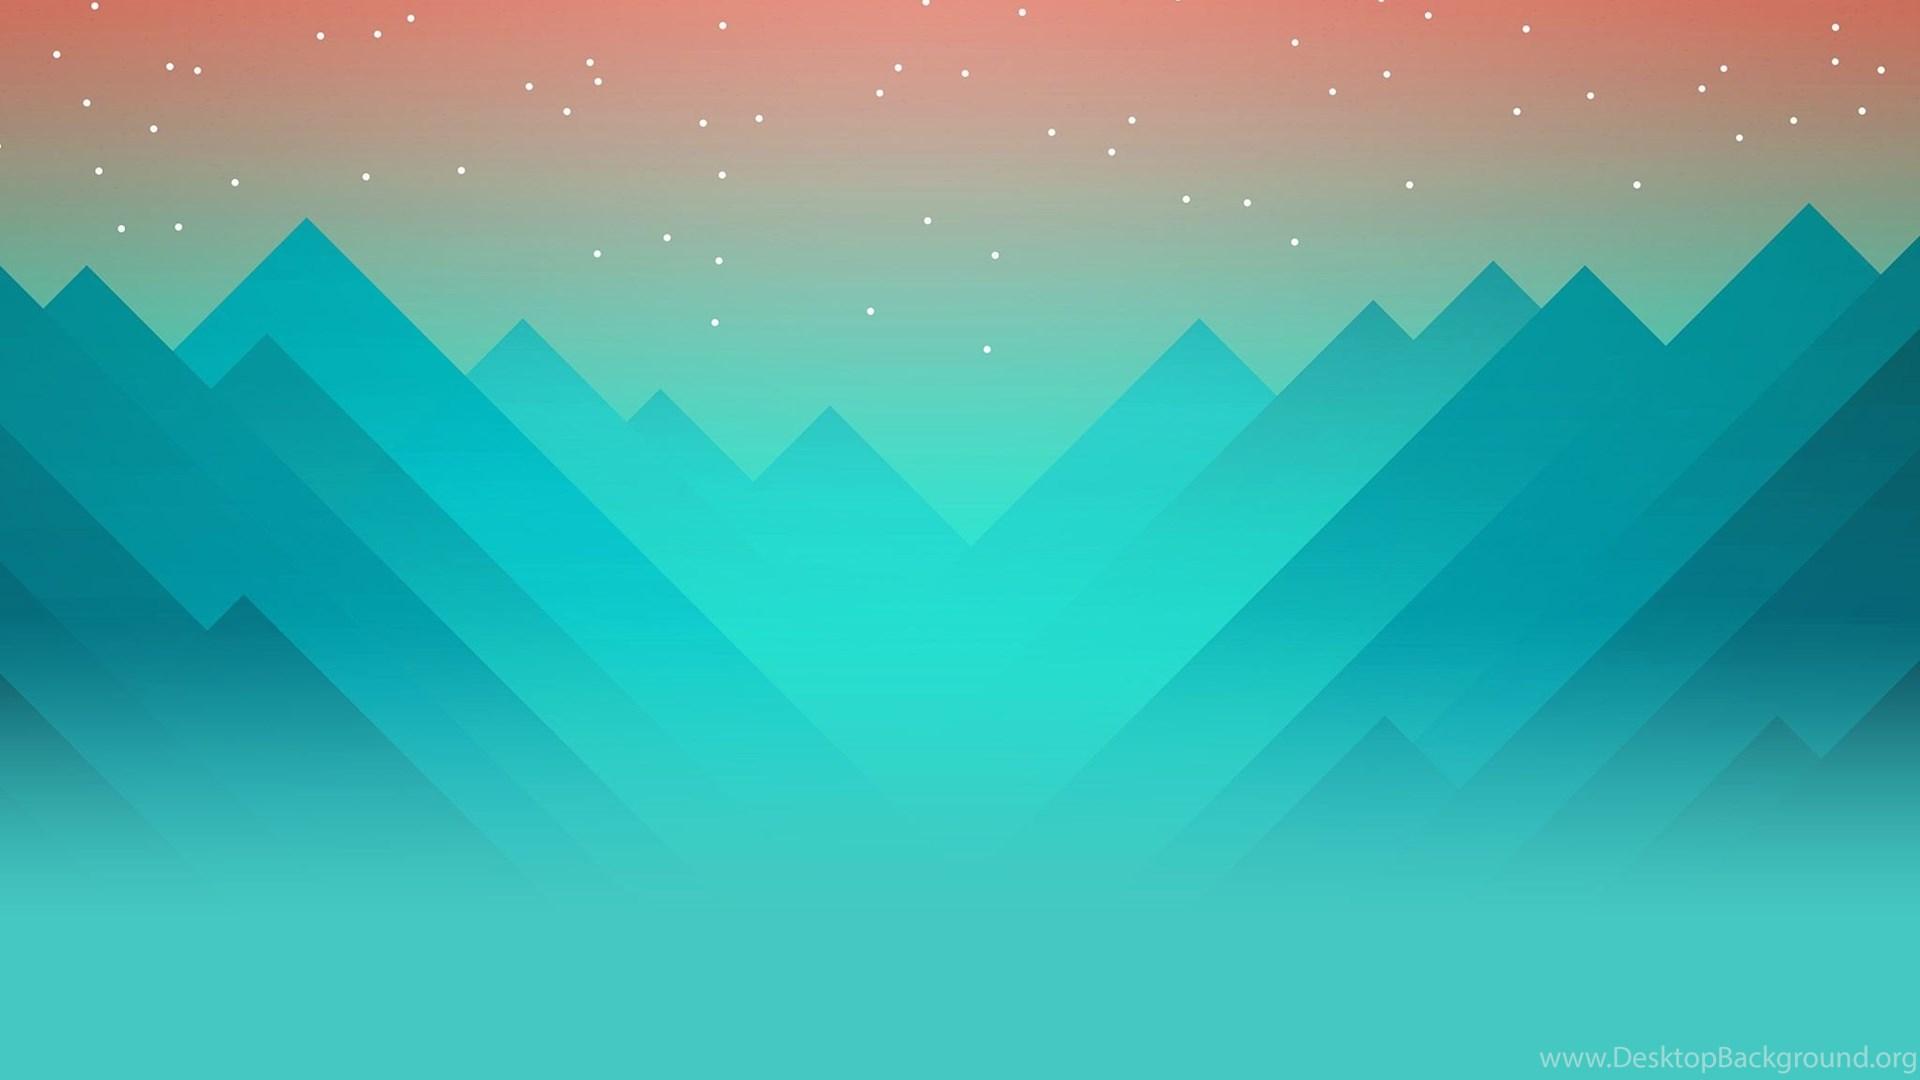 2d Triangle Landscape Wallpapers Desktop Background